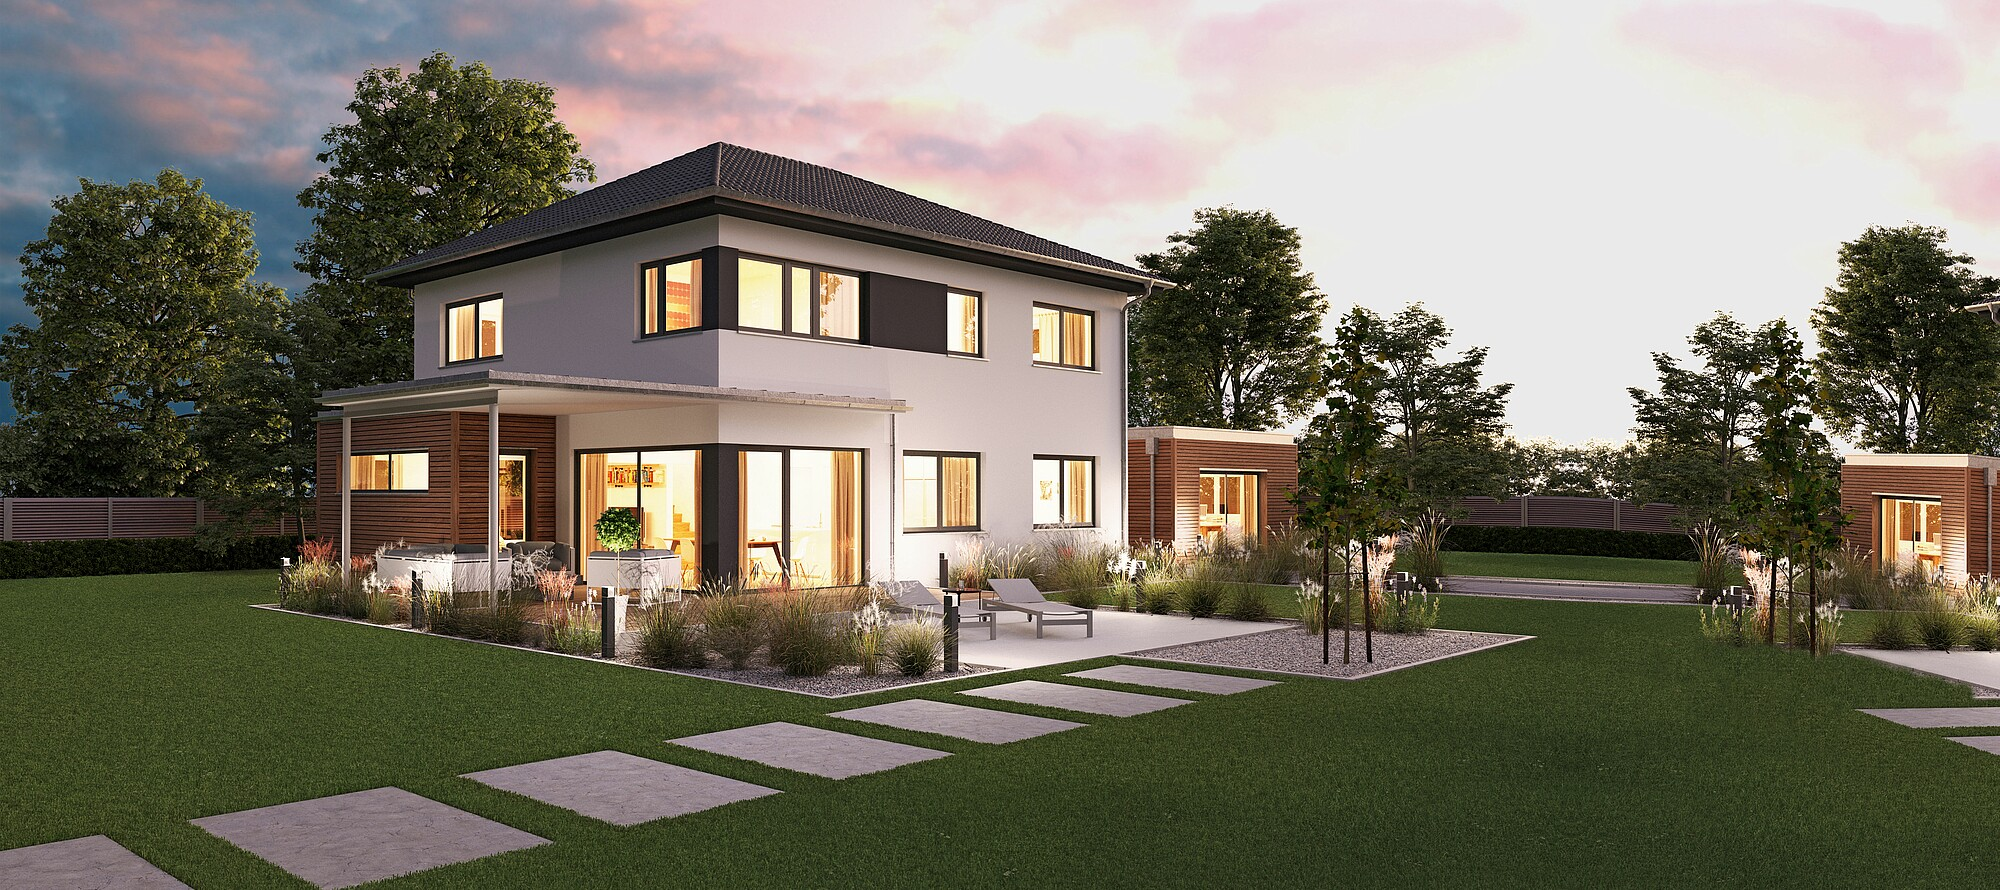 fertighaus villa 178 hanse haus. Black Bedroom Furniture Sets. Home Design Ideas